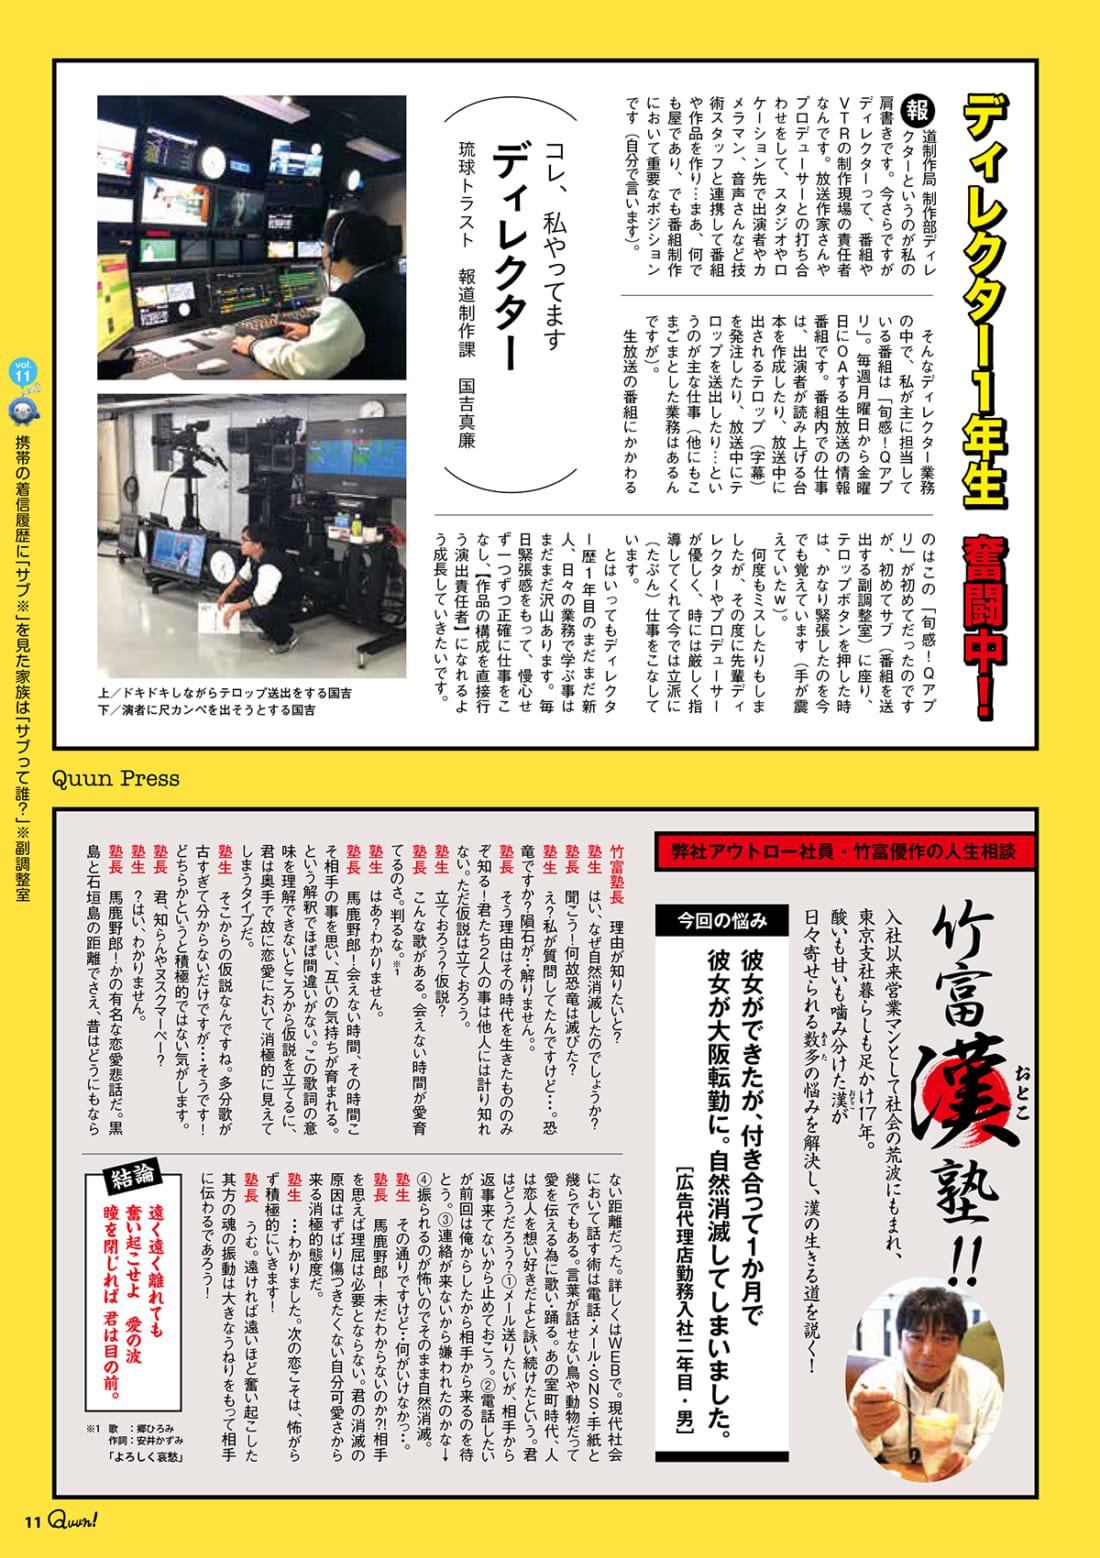 https://www.qab.co.jp/qgoro/wp-content/uploads/quun_1113-1100x1558.jpg